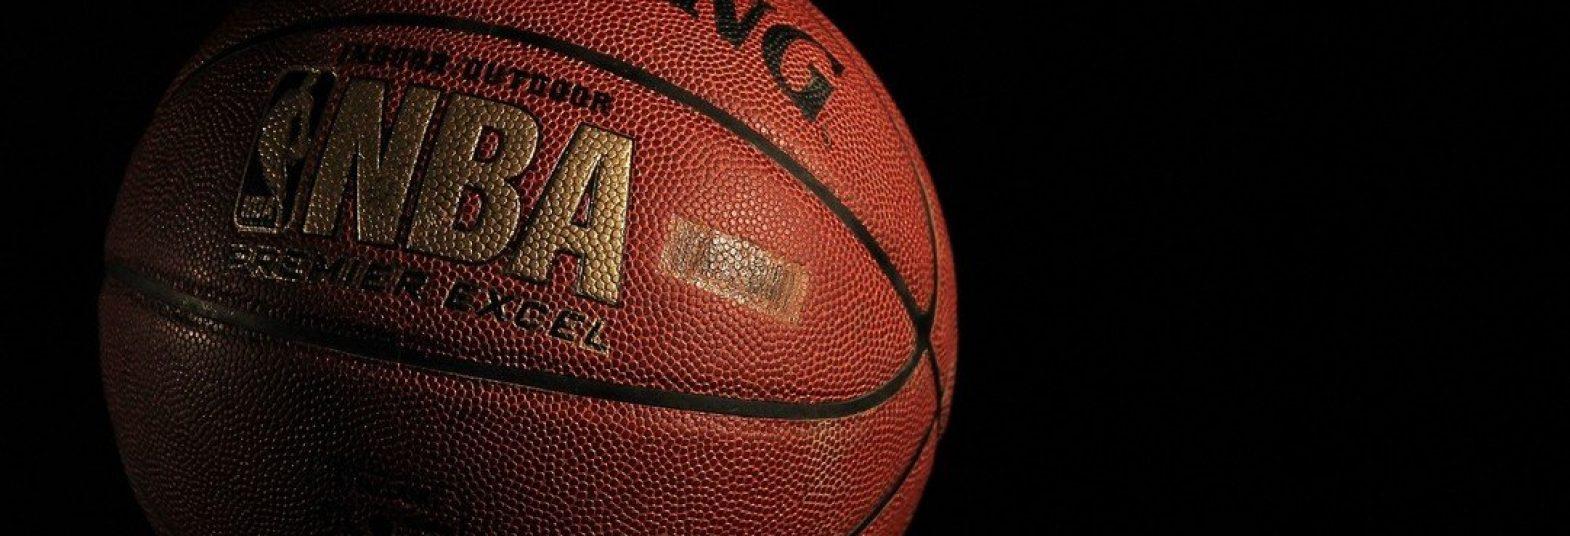 Una pallone da basket